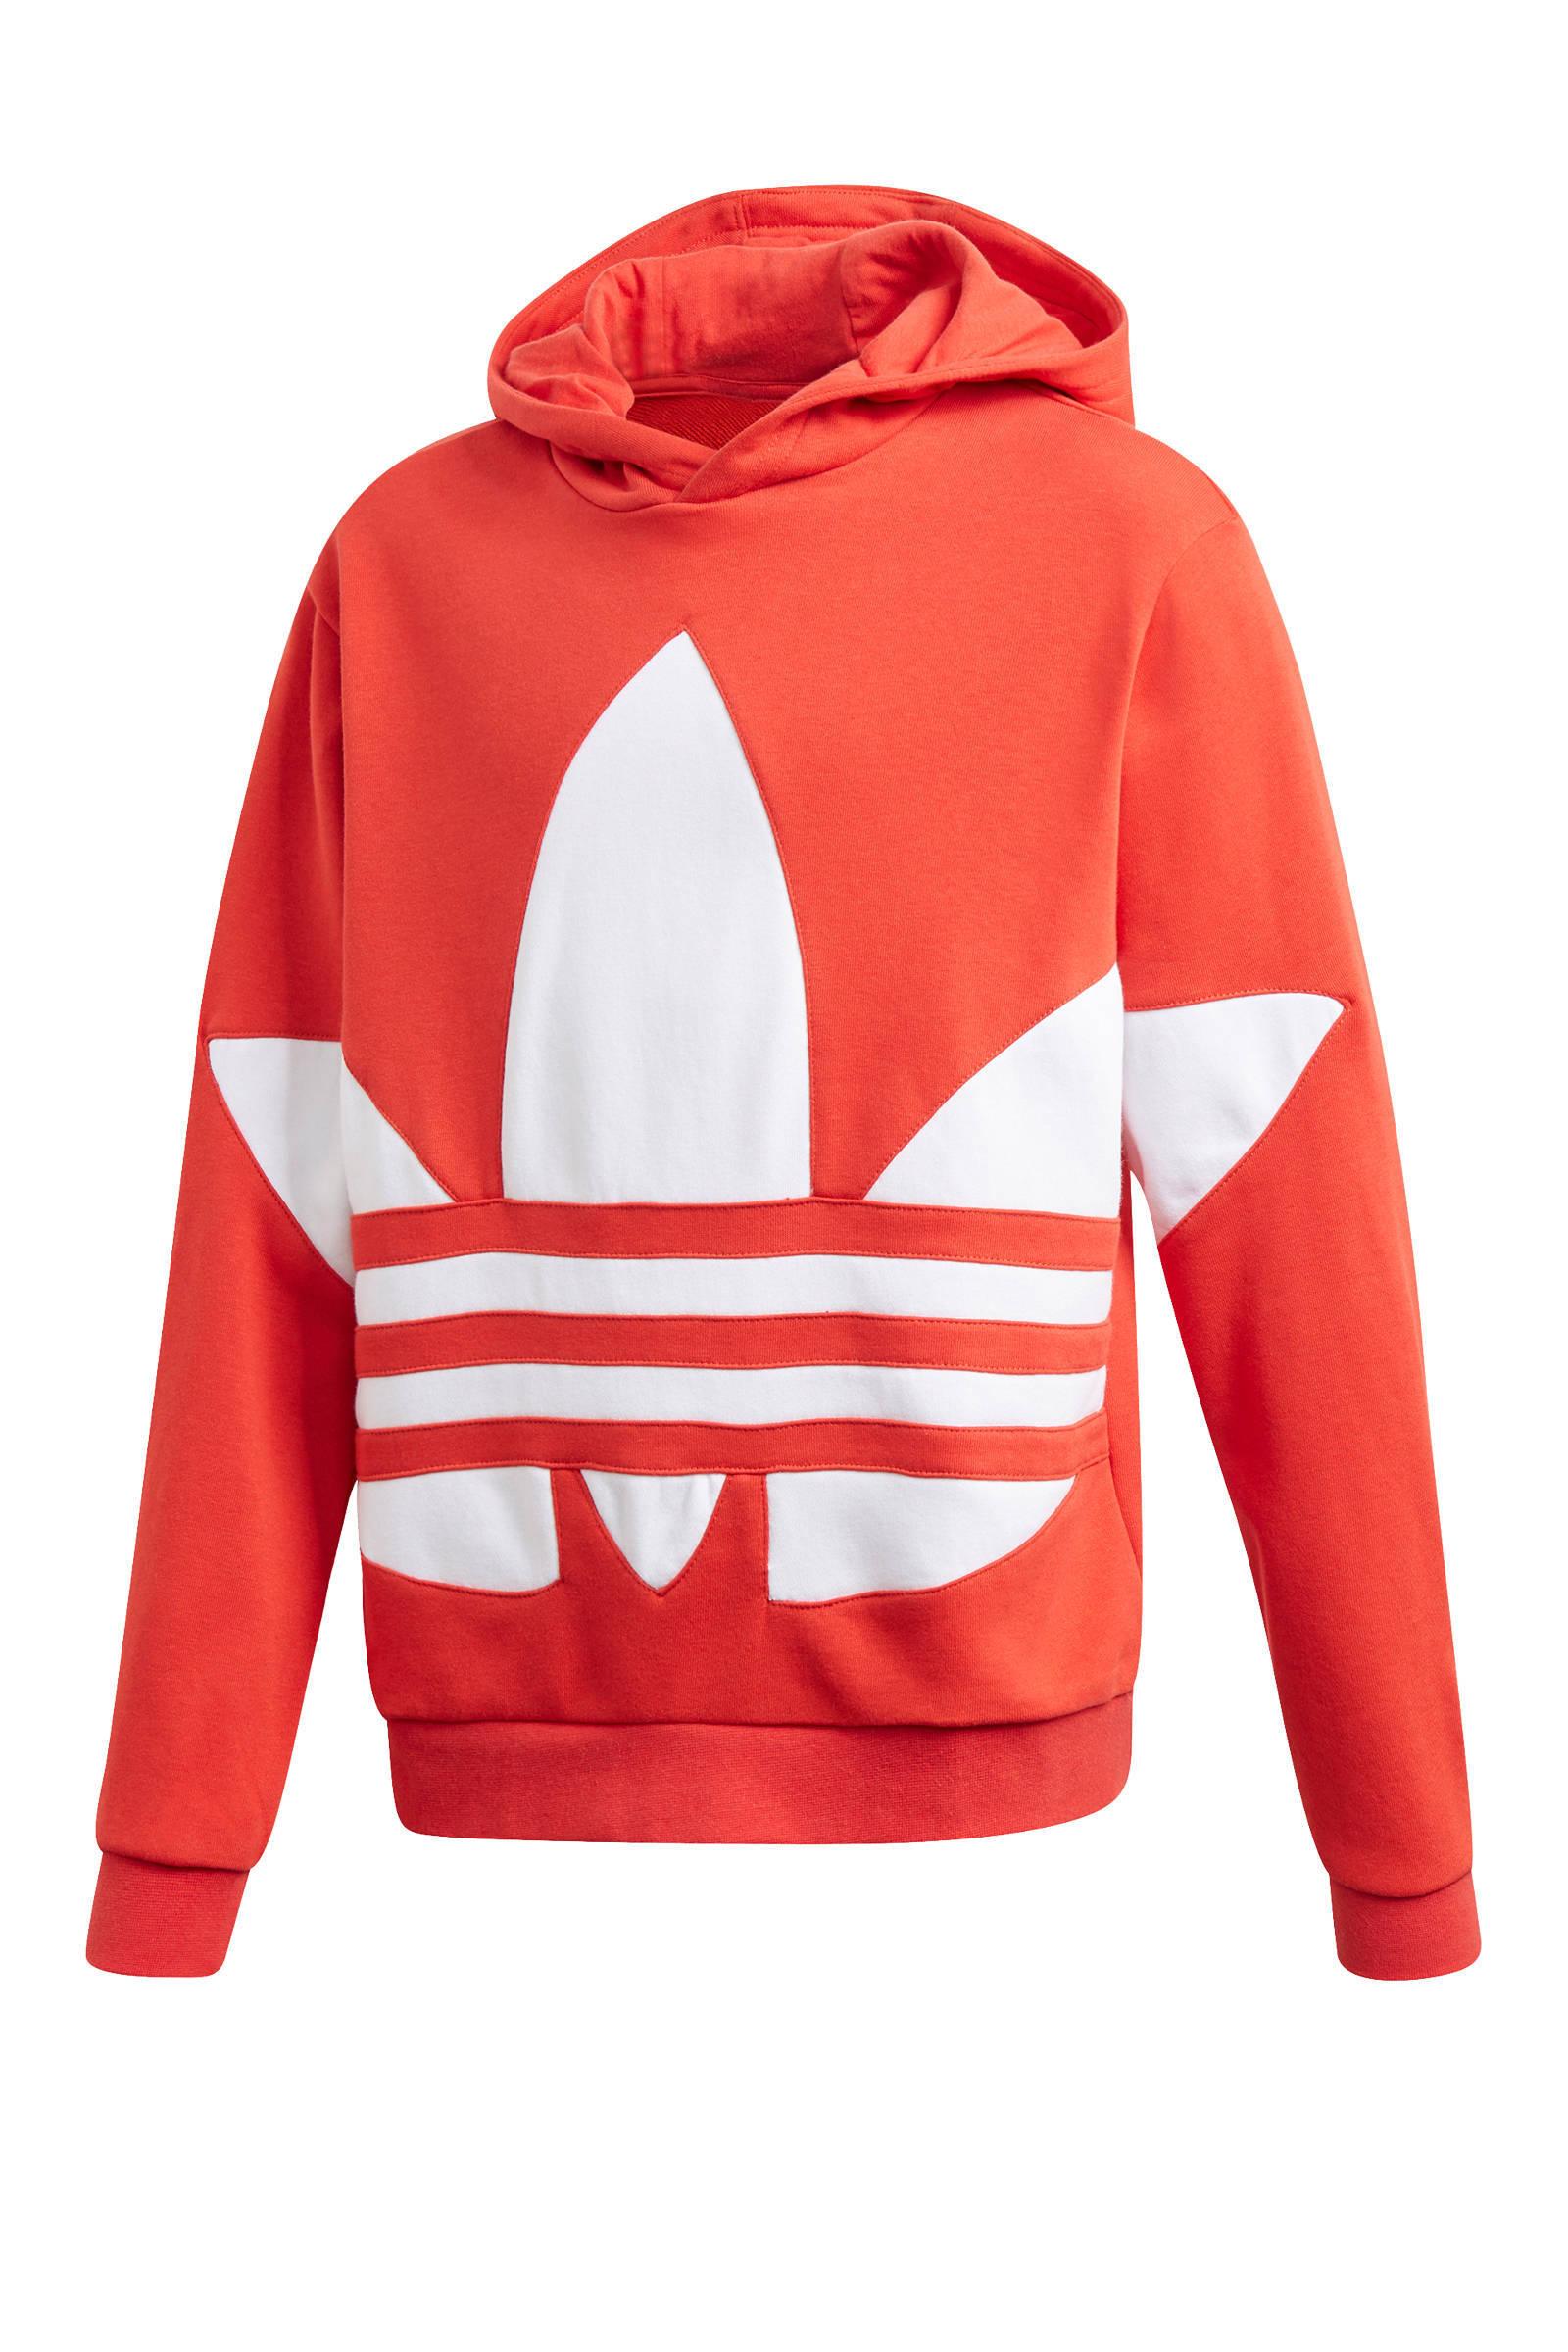 adidas Originals cropped hoodie donkerblauw | wehkamp